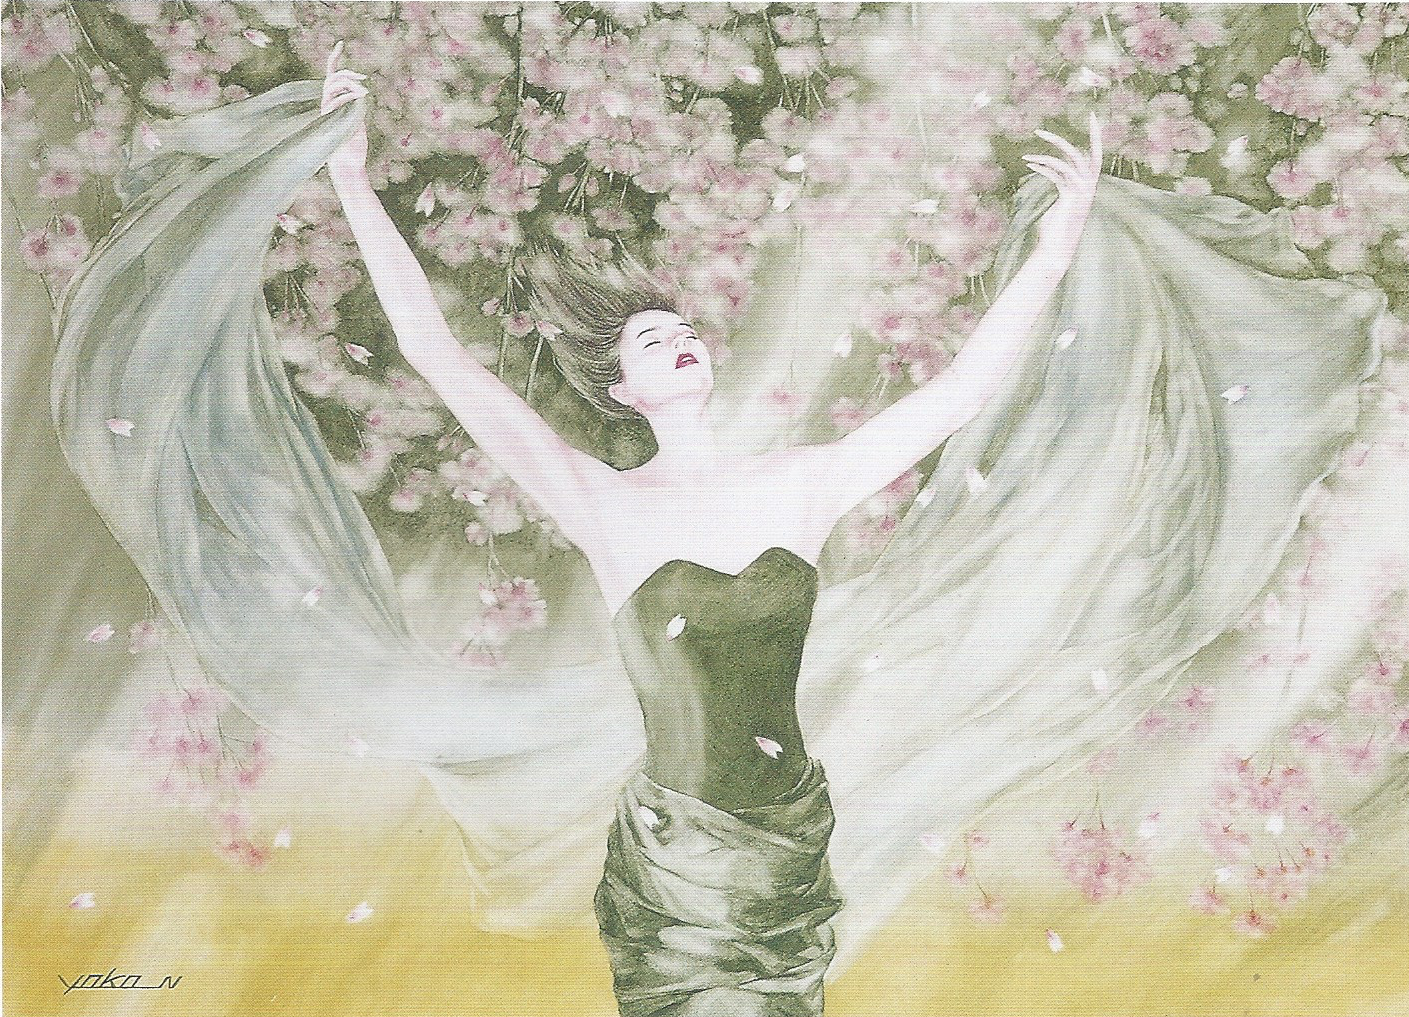 "Yoko Nakagawa: Shower of Cherry Blossoms,  Watercolor on paper, 20.8"" x 28.4"", 2001"